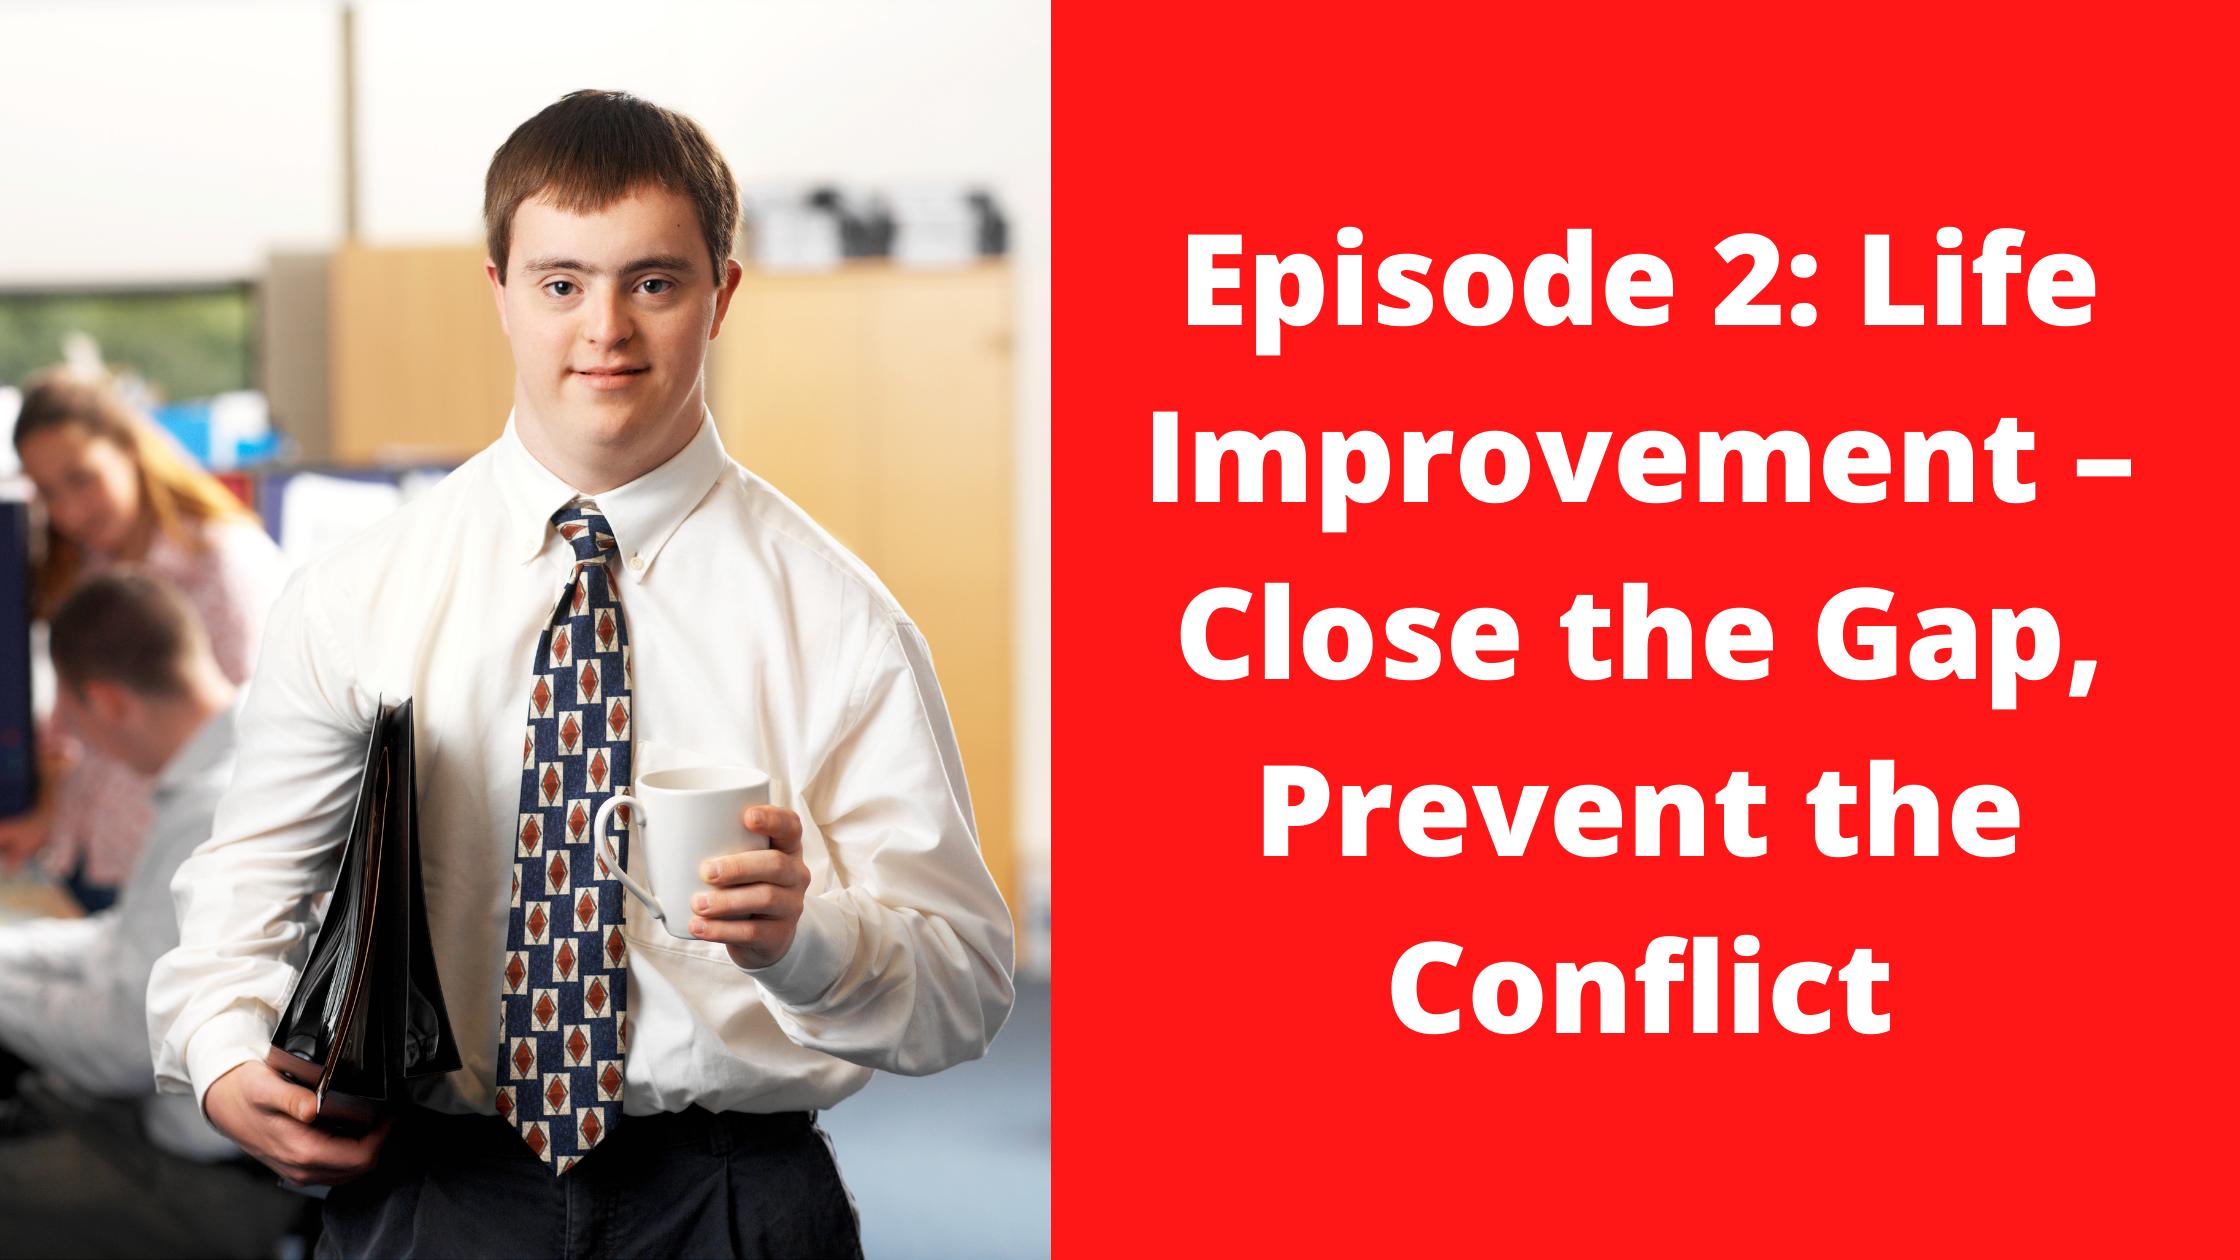 Episode 2 Life Improvement Close the Gap Prevent the Conflict